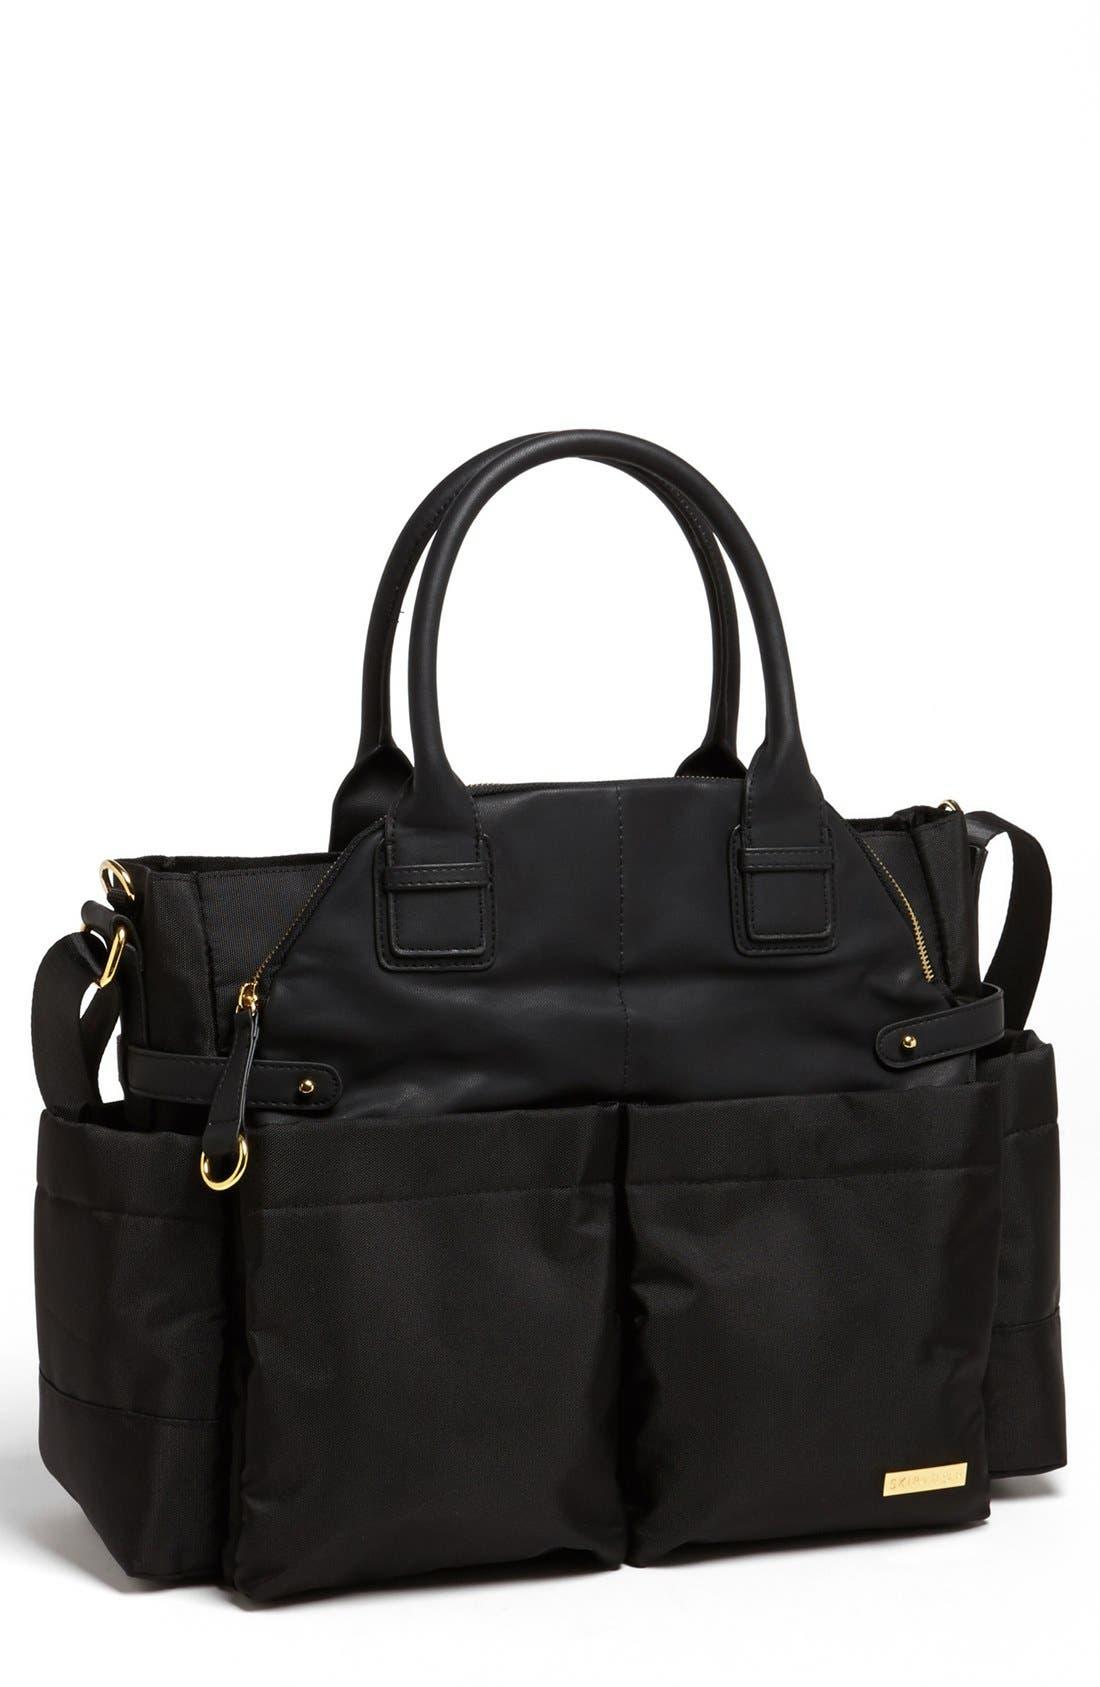 Skip Hop 'Chelsea' Diaper Bag